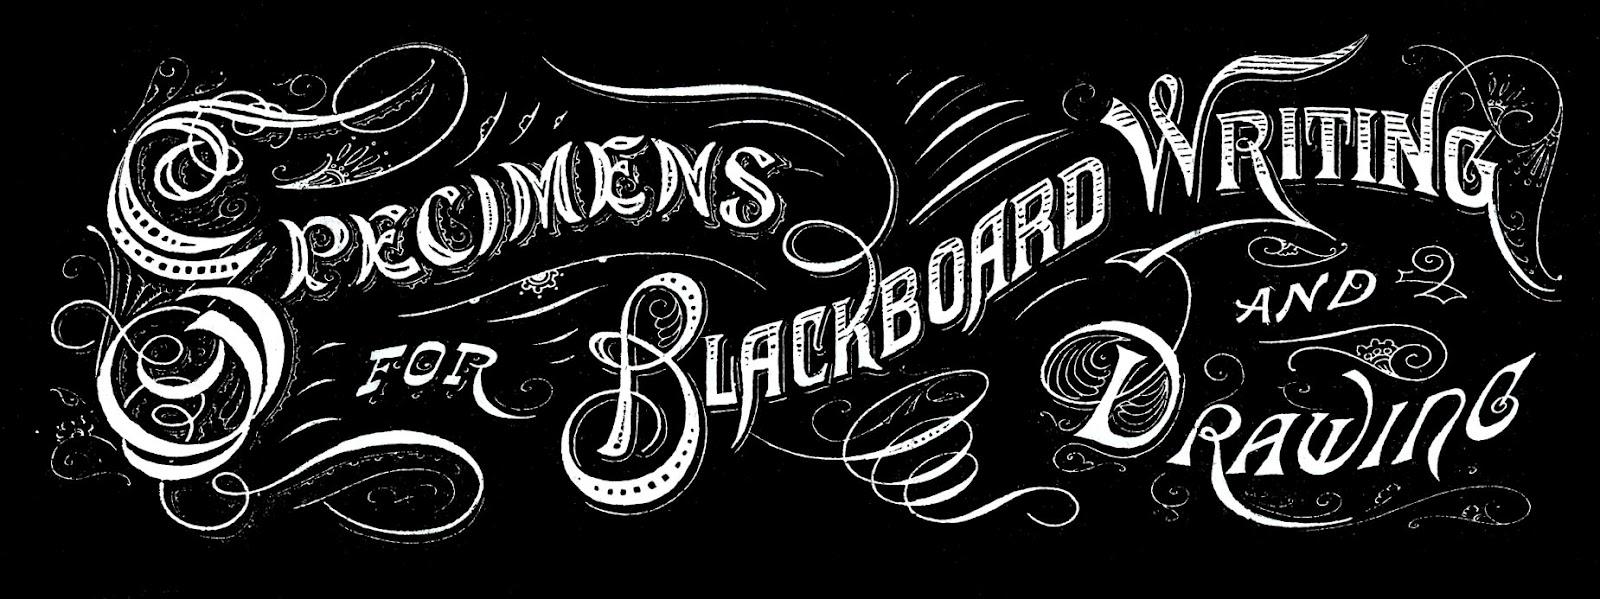 vintage typography amazing chalkboard text